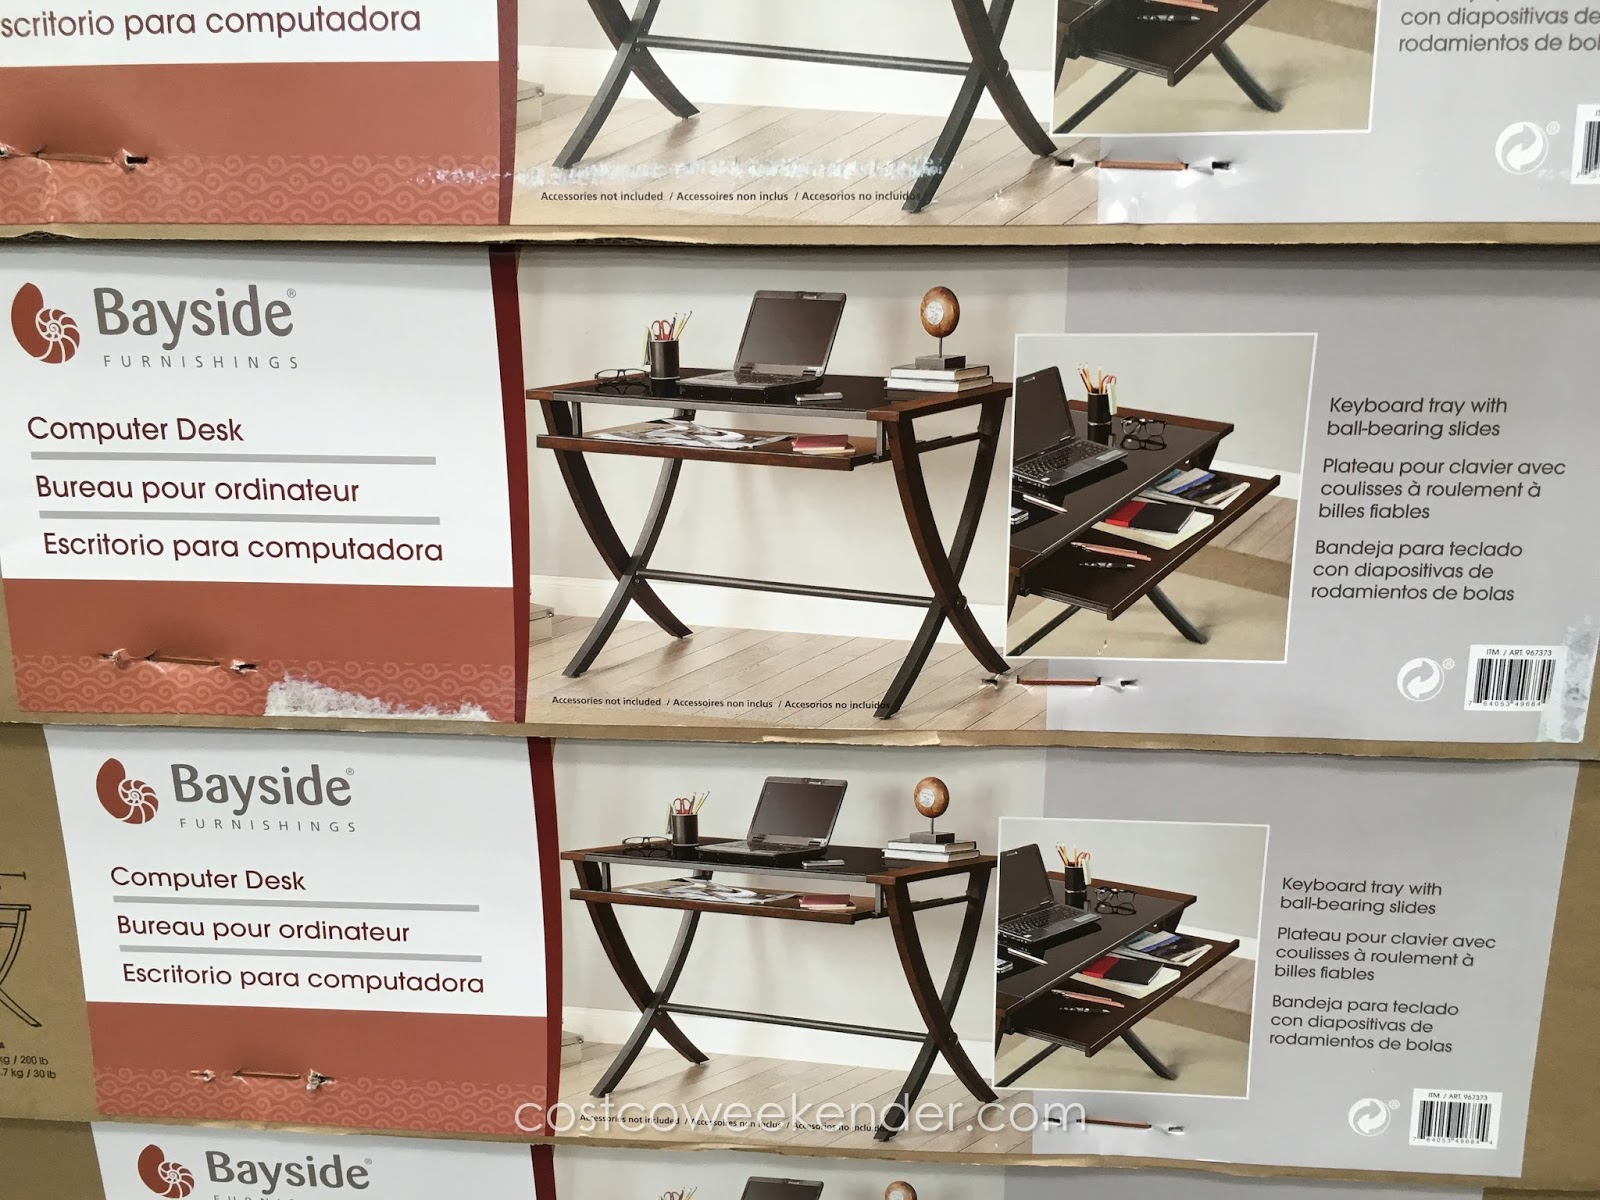 Bayside Furnishings 48 inch puter Desk